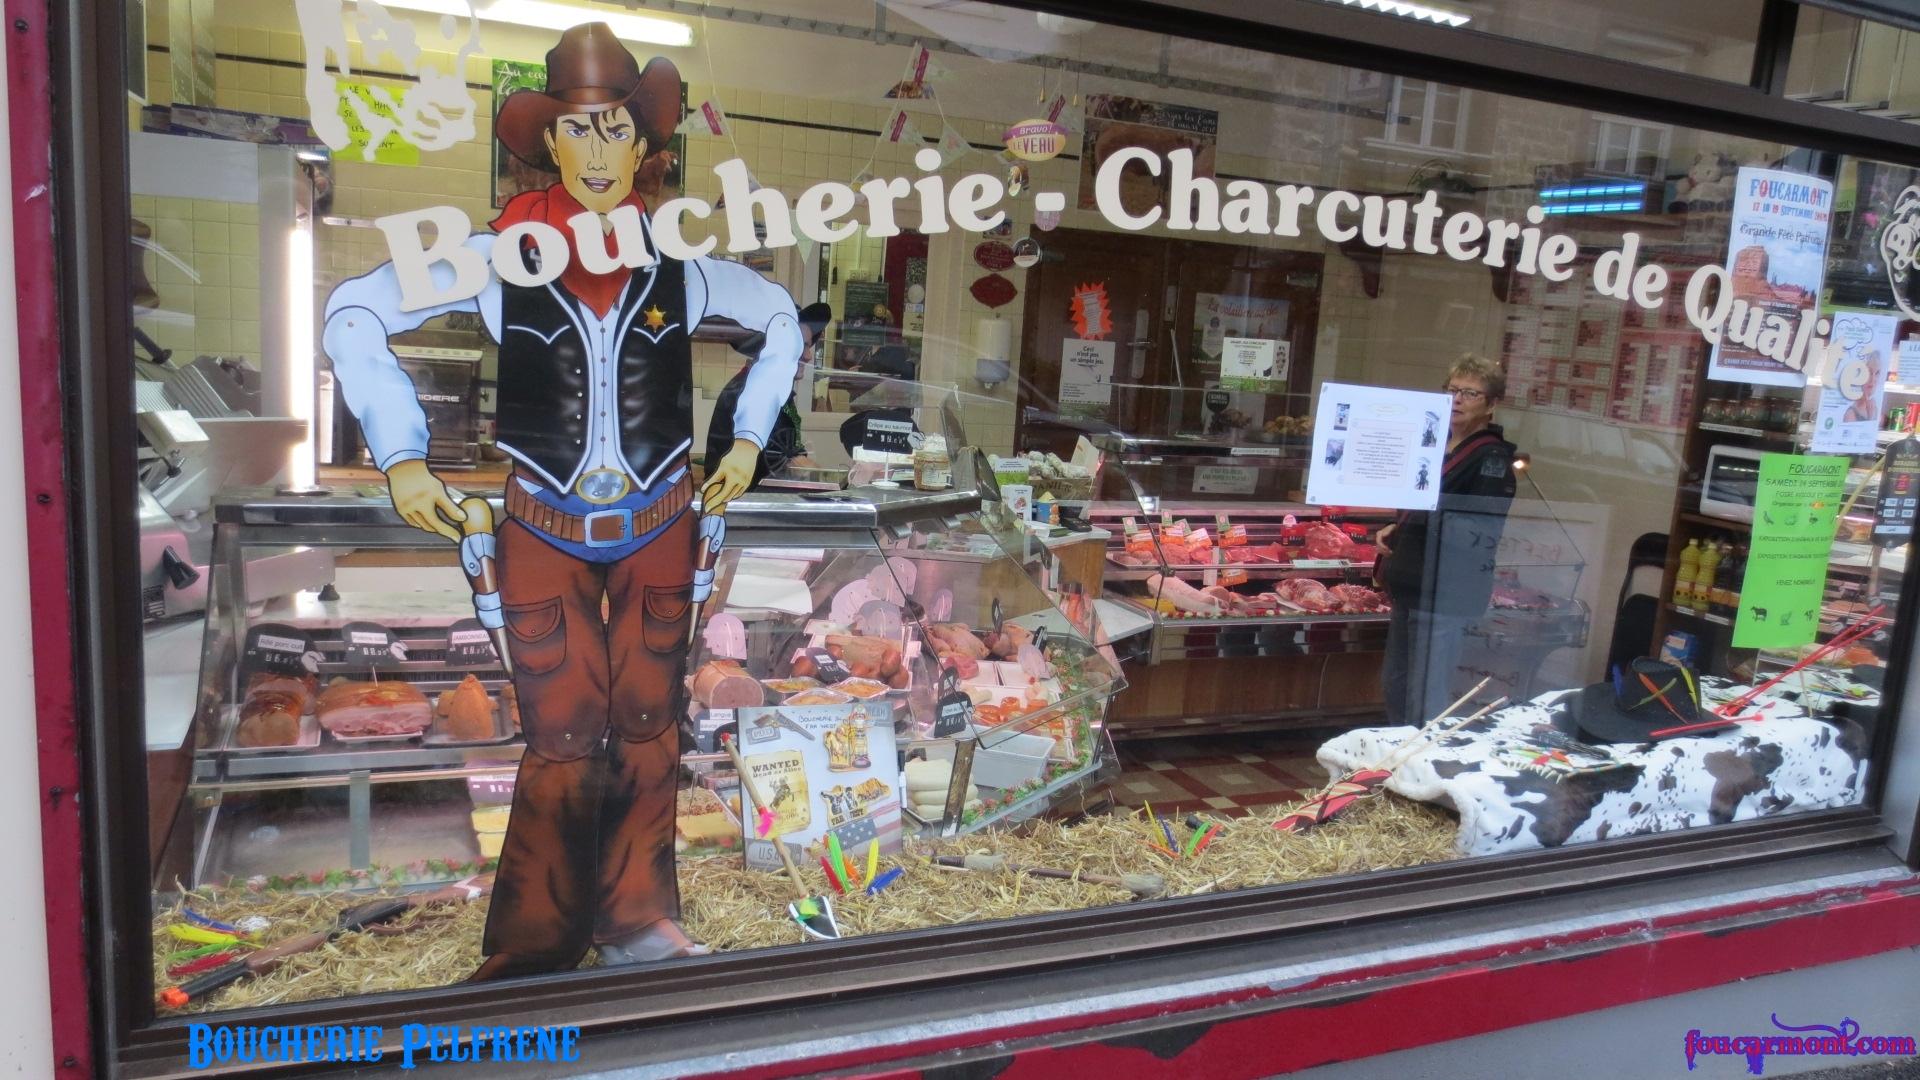 Boucherie Pelfrène